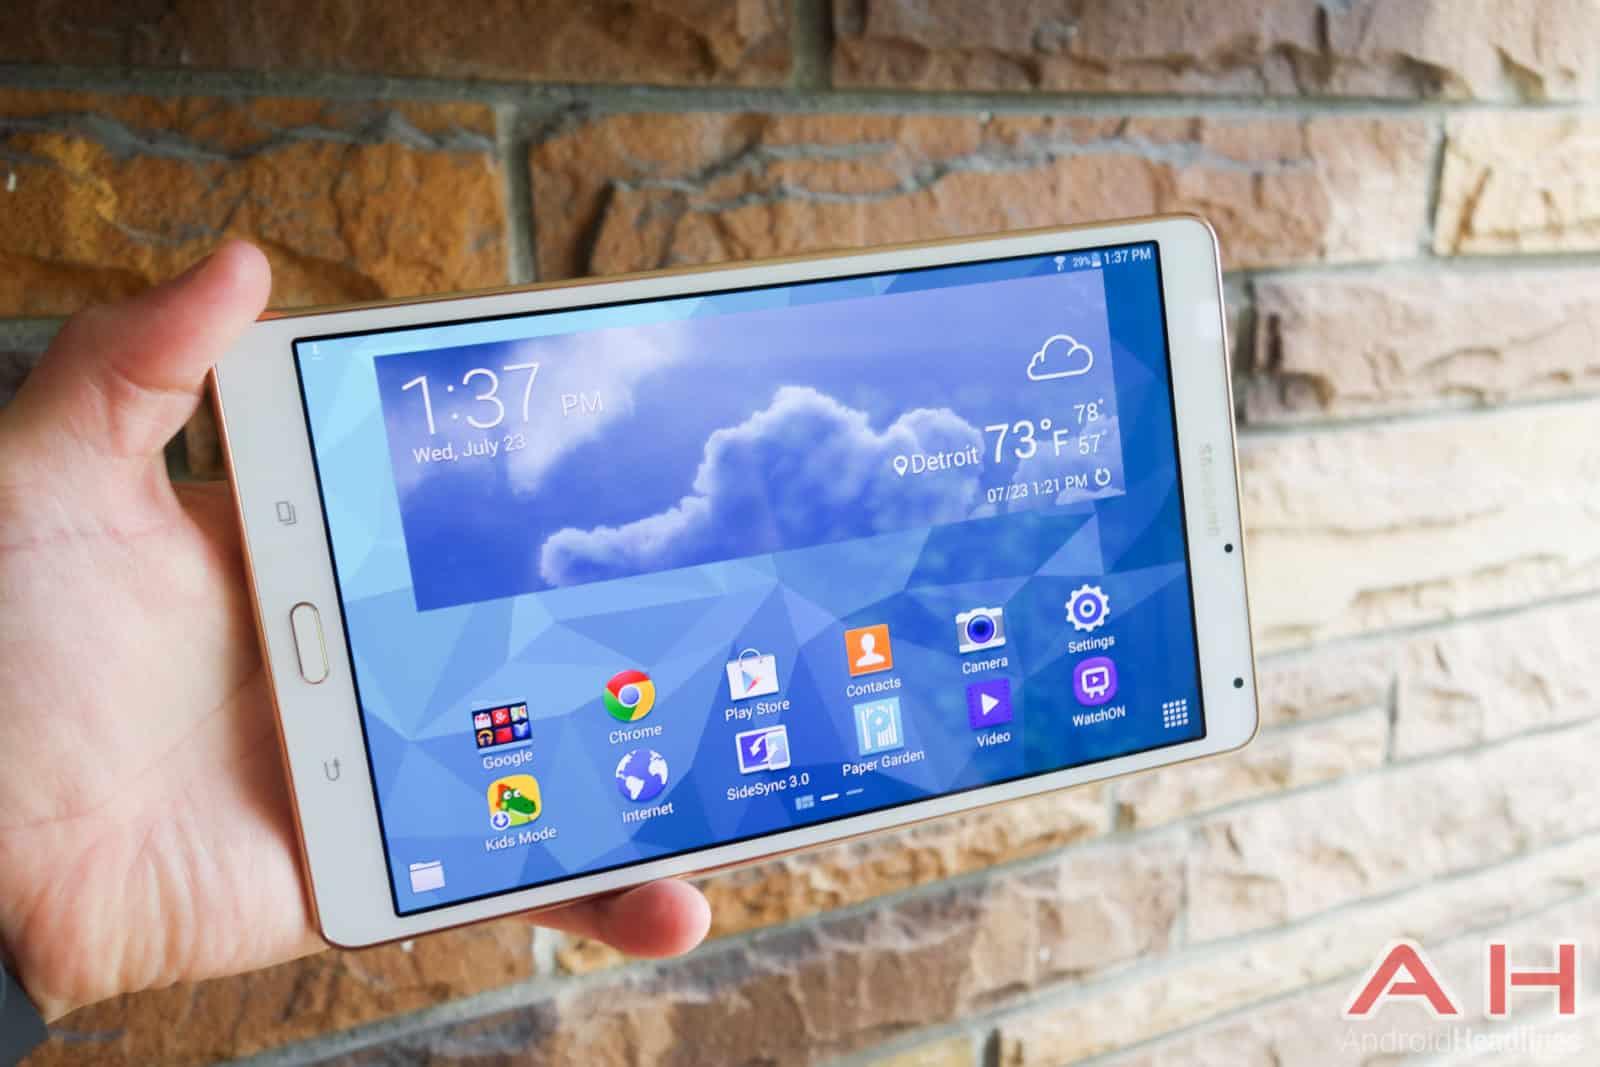 Samsung-Galaxy-Tab-S-Review-AH-9